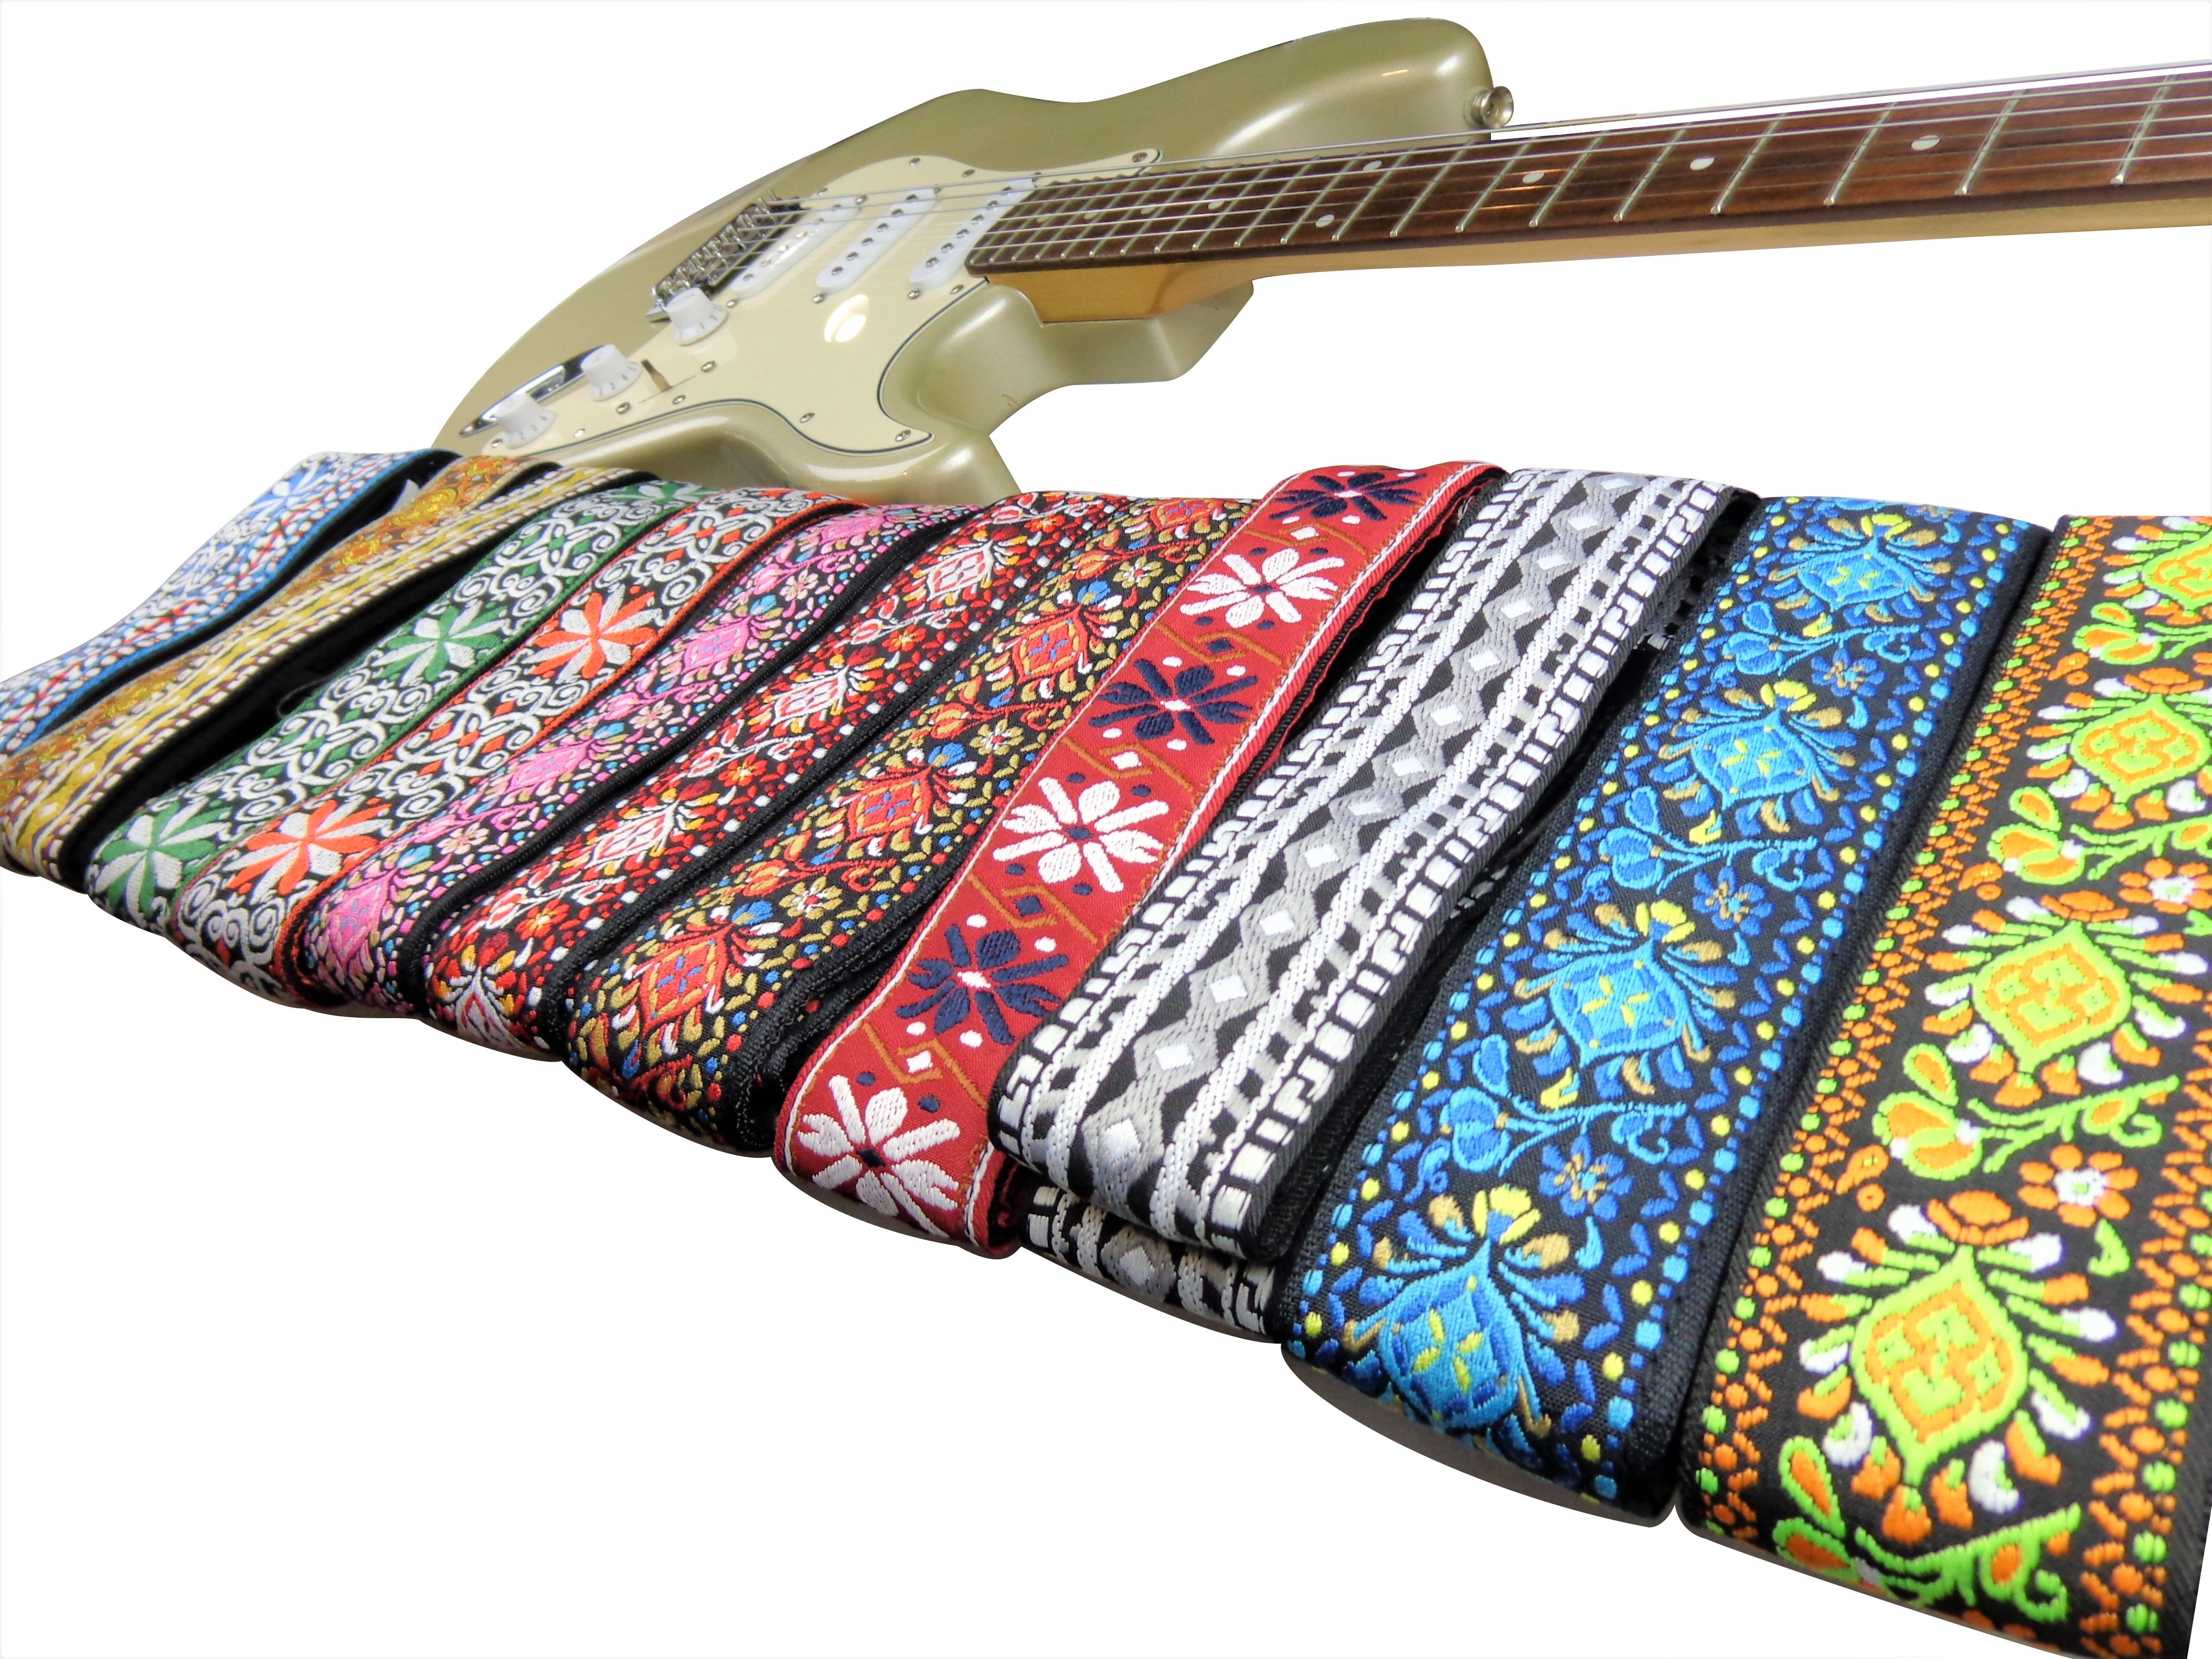 New-Retro-Vintage-Jacquard-Woven-Acoustic-Electric-Guitar-Strap thumbnail 15